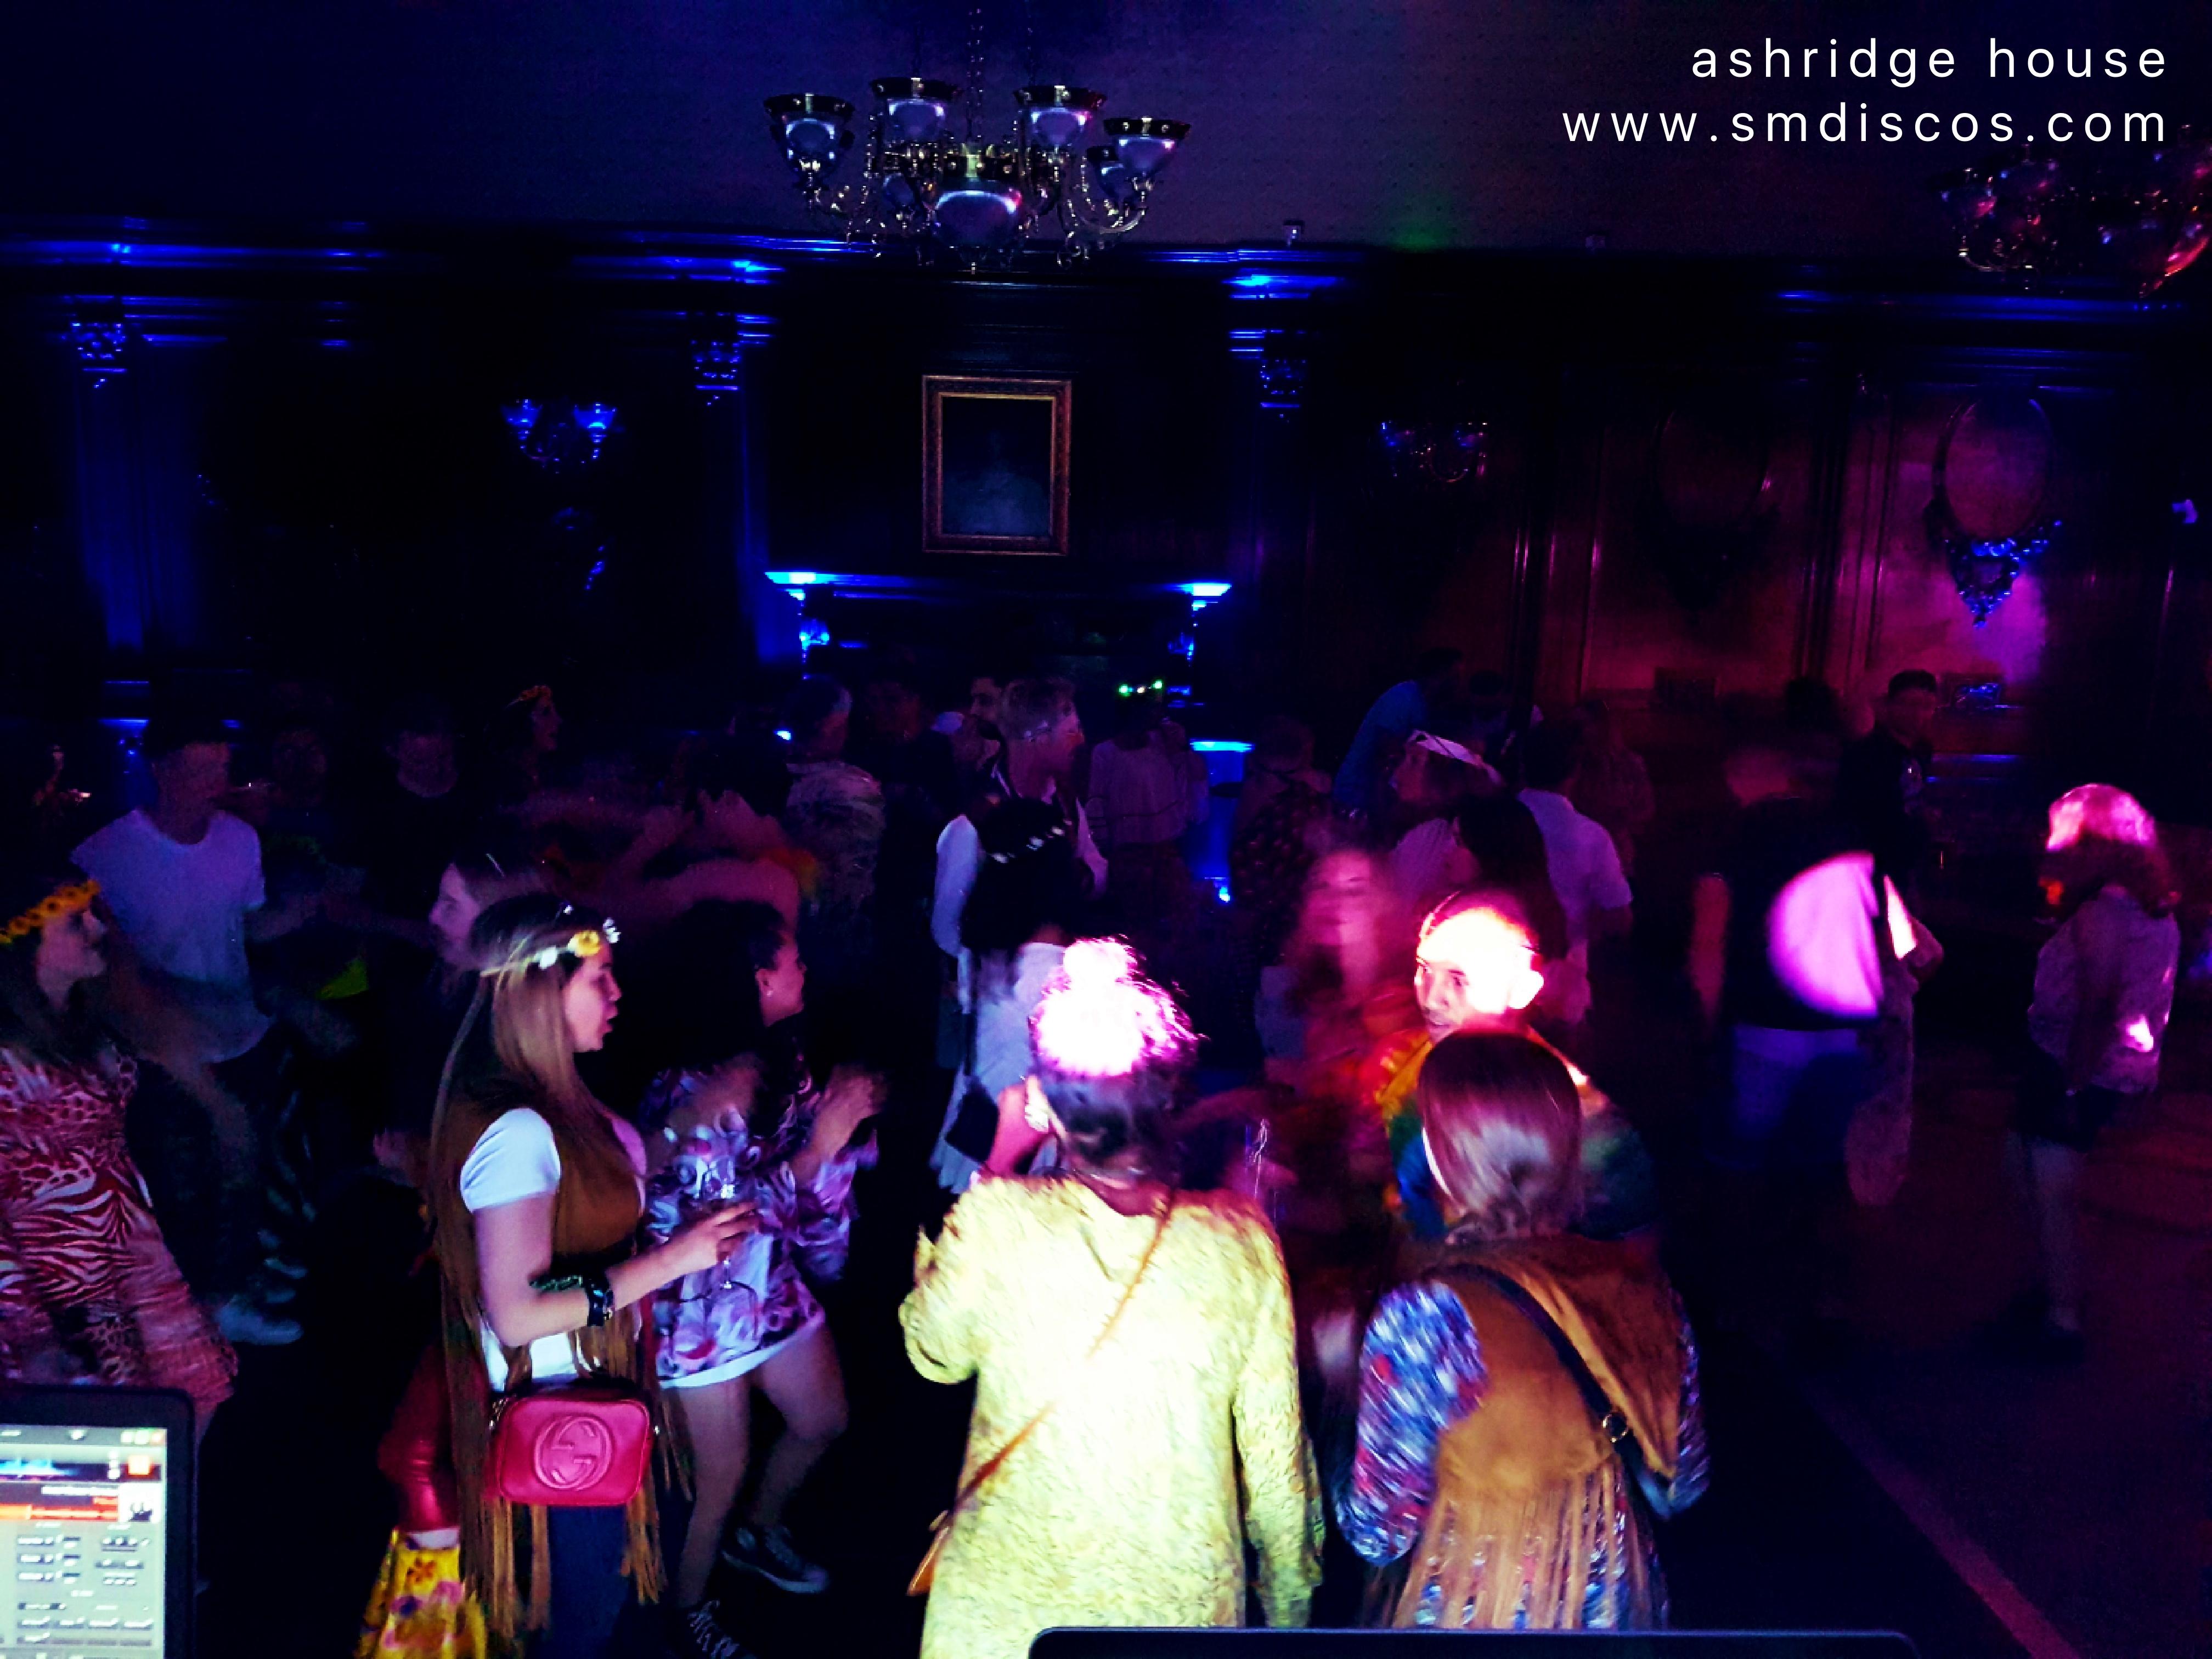 ashridge house corporate event